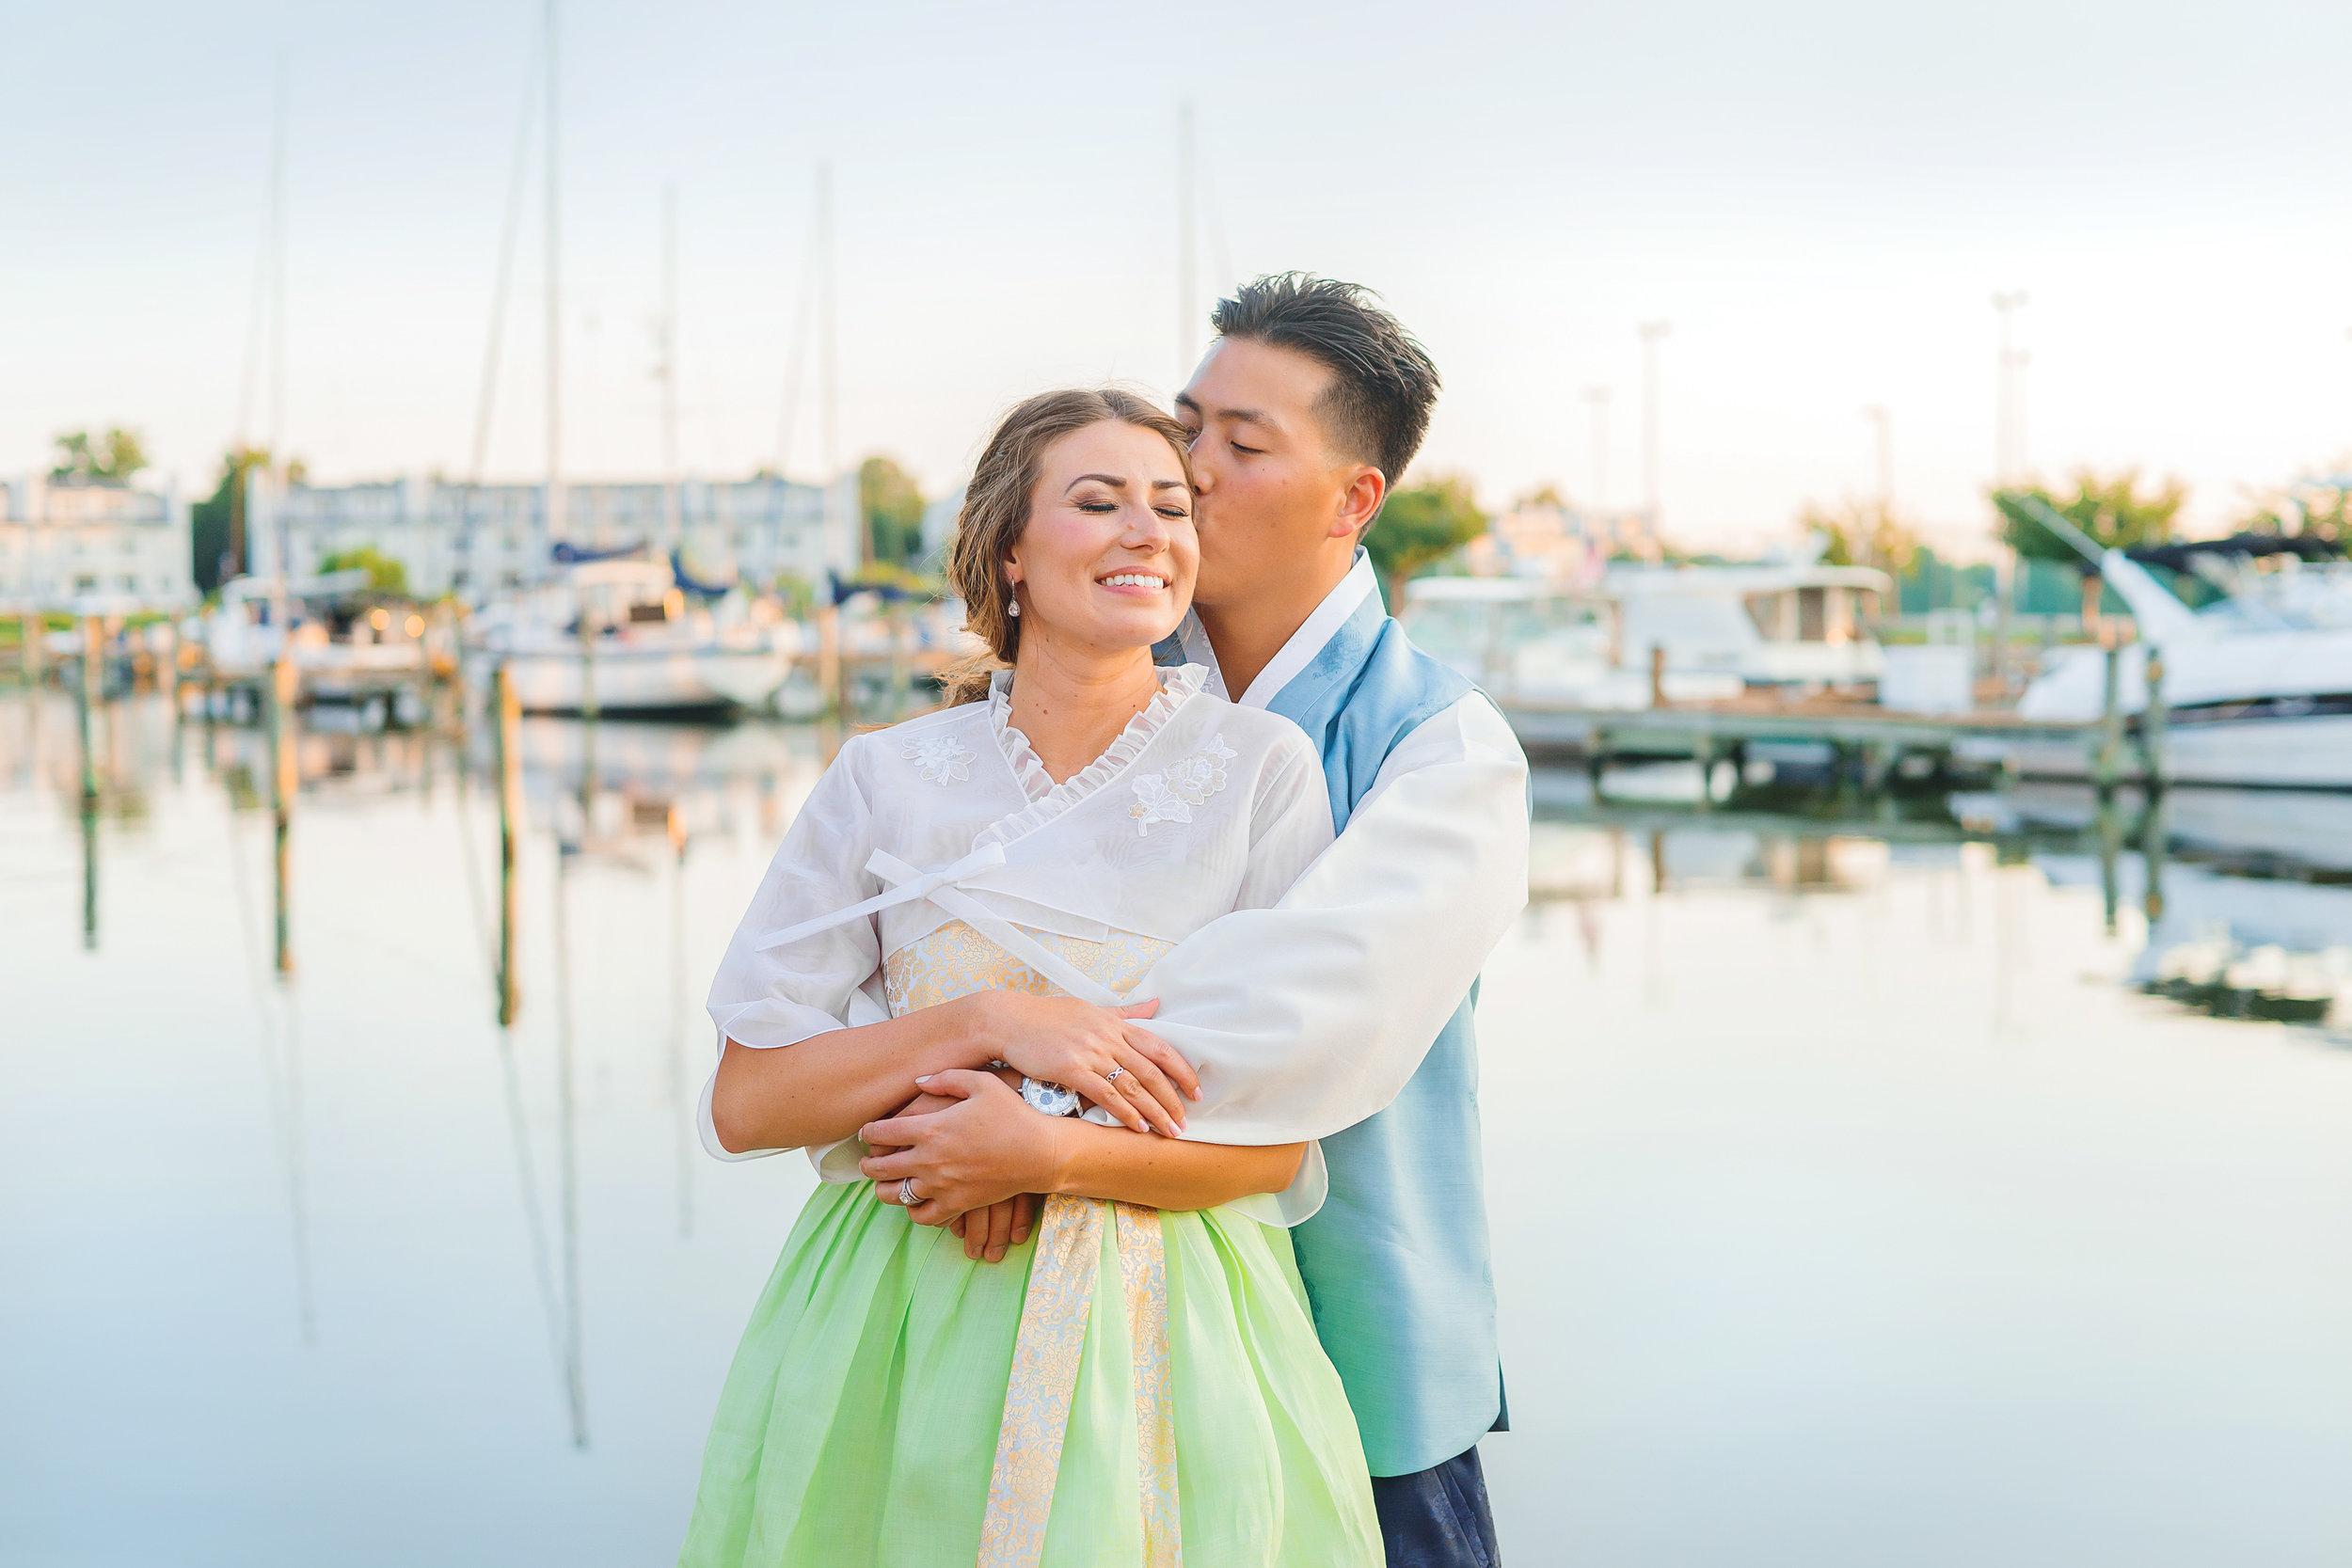 Waterfront sunset wedding in Annapolis by Jessica Nazarova